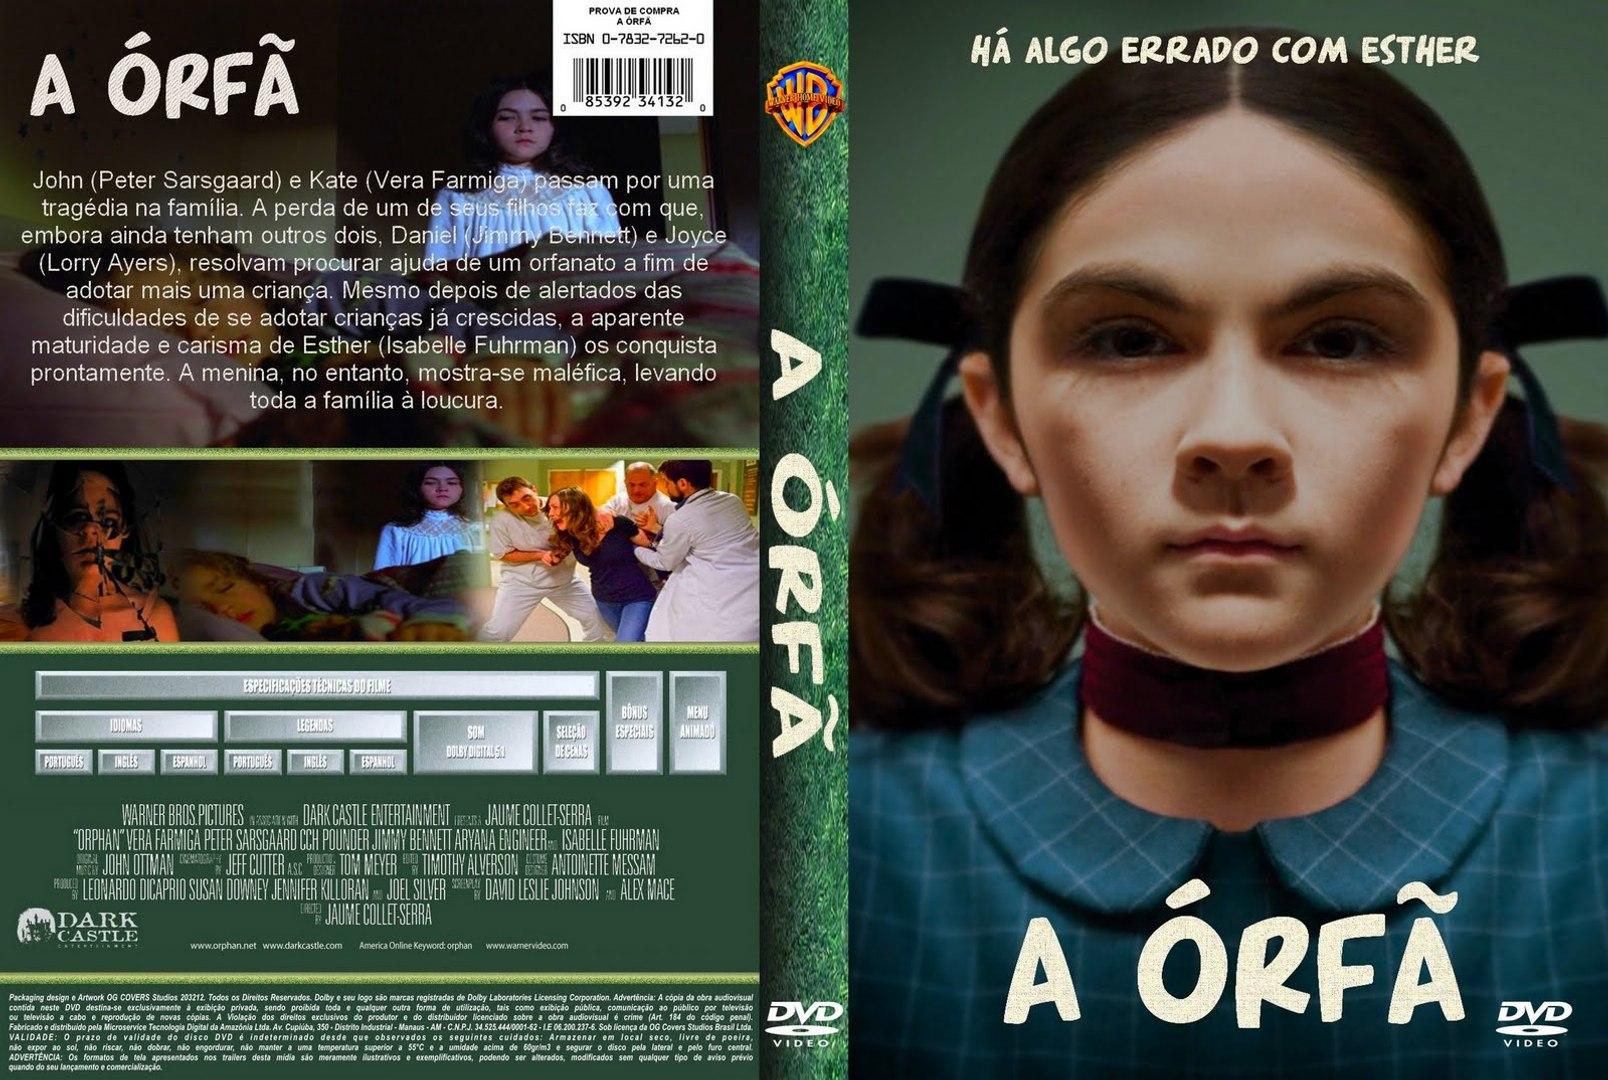 ORF BAIXAR A FILMES 2